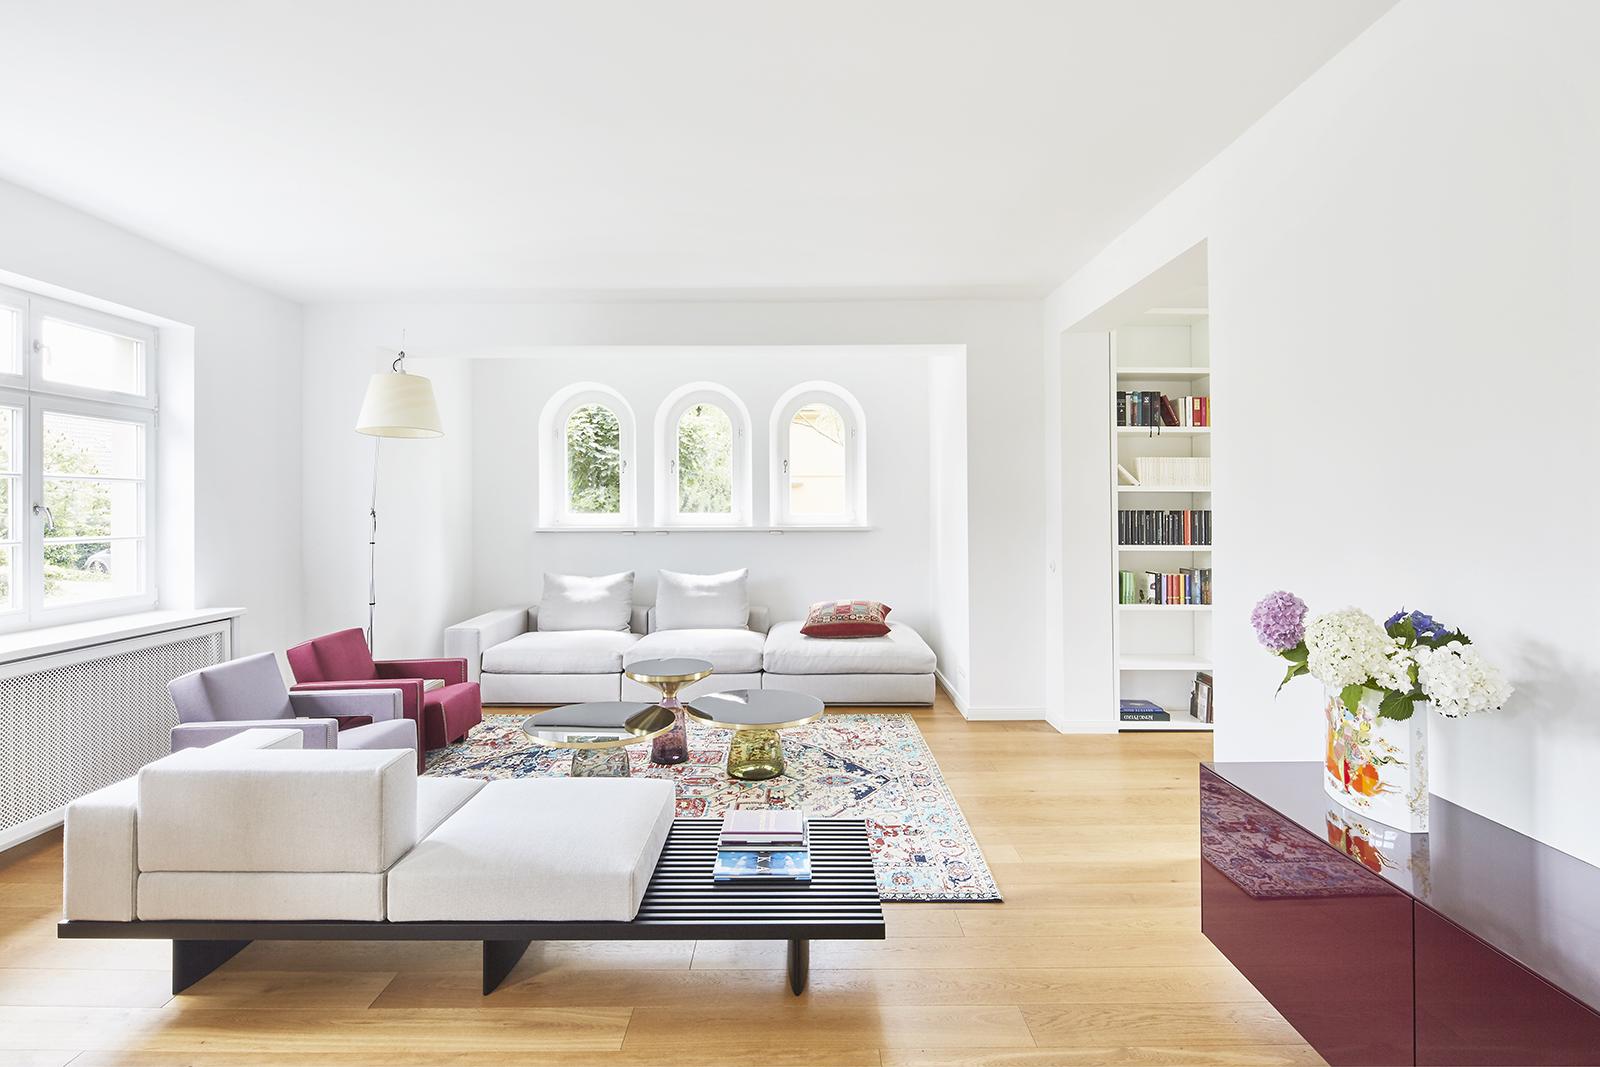 Interiorfotograf Architekturfotograf Immobilienfotograf Köln Düsseldorf